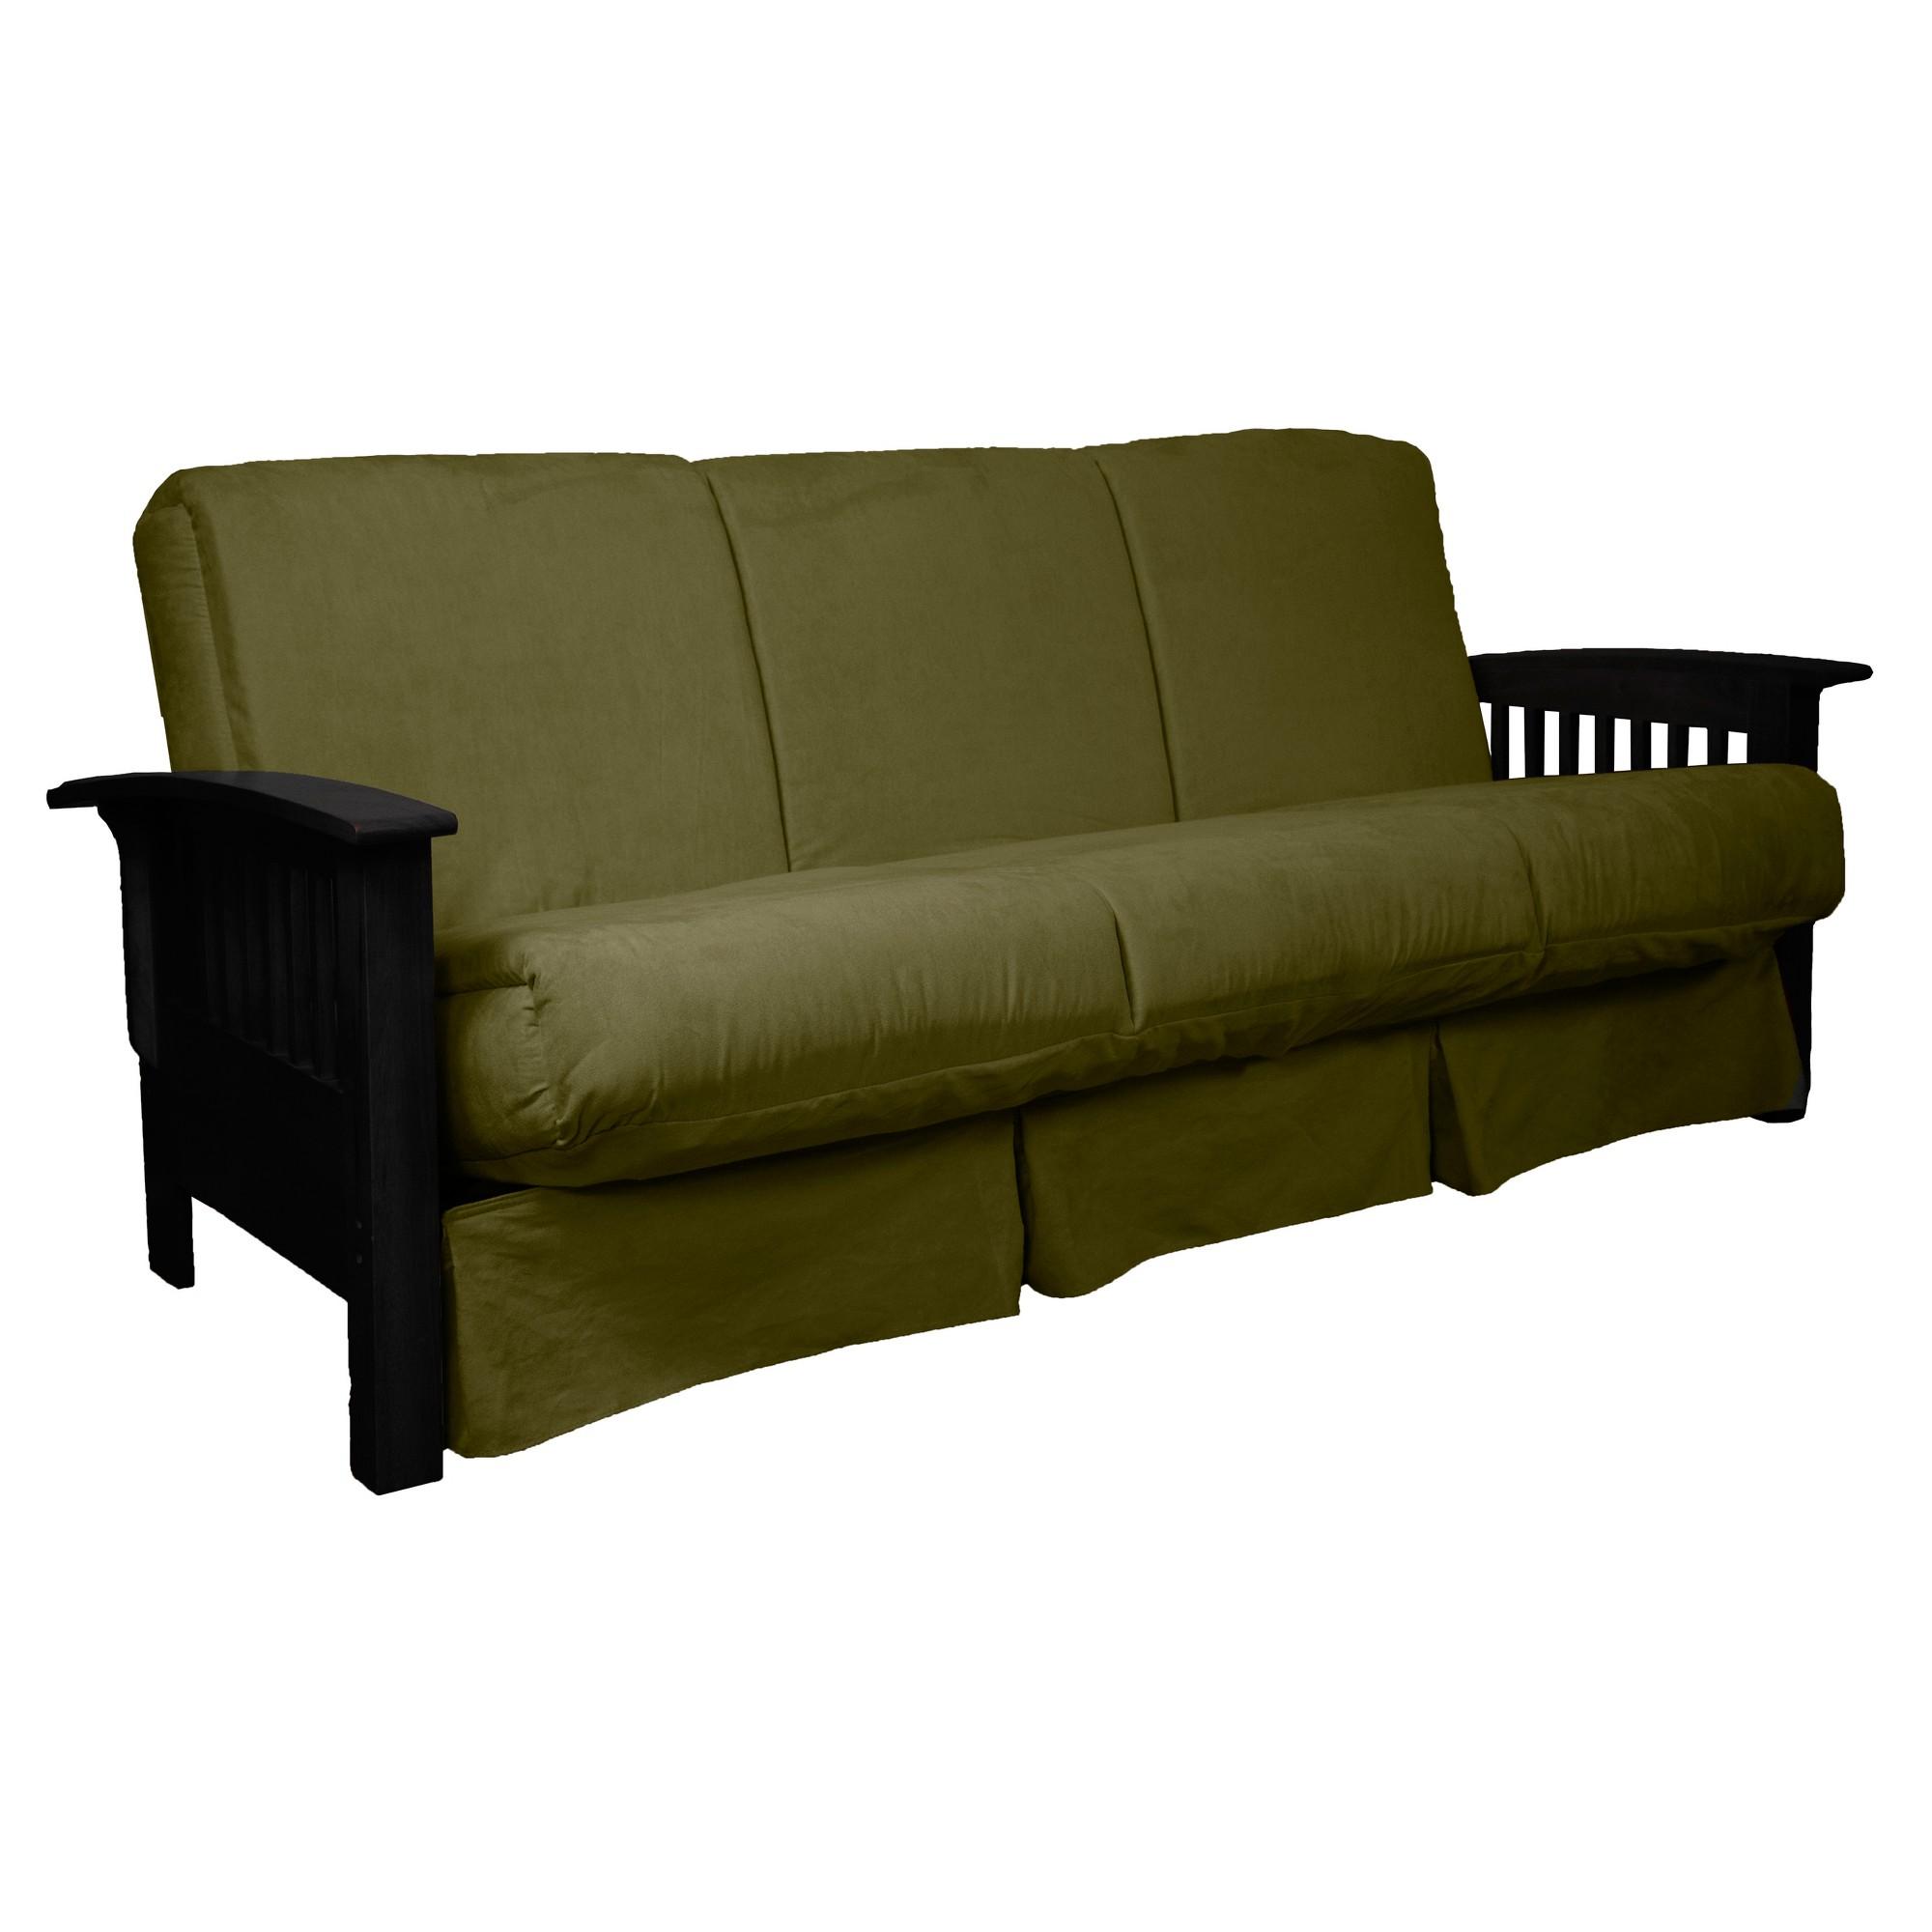 Fabulous Stickley Perfect Futon Sofa Sleeper Black Wood Finish Ncnpc Chair Design For Home Ncnpcorg